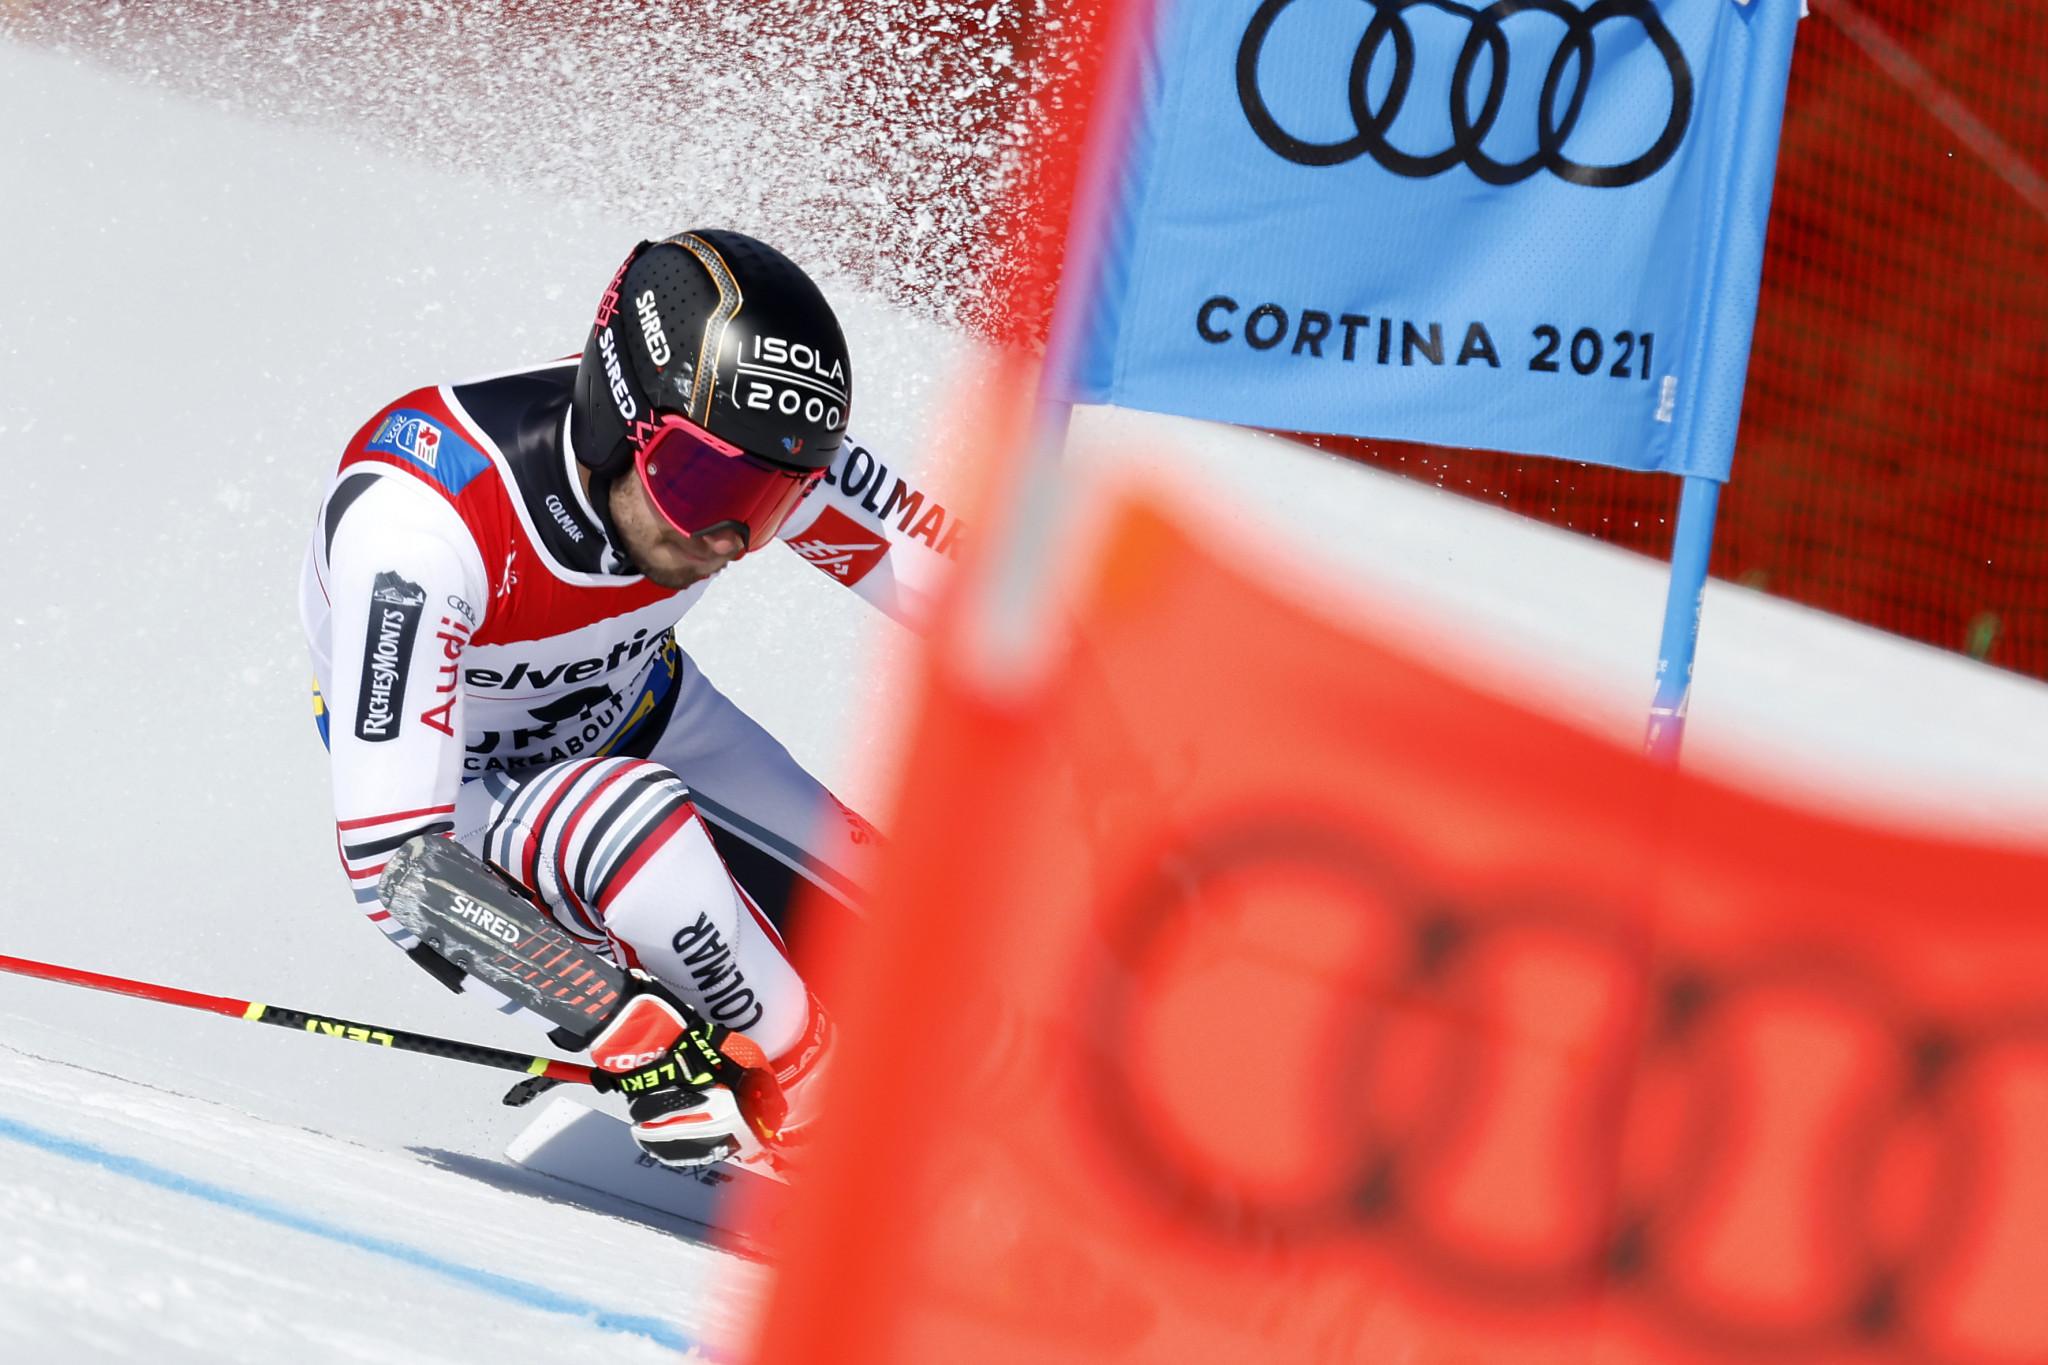 Faivre wins giant slalom title as Pinturault falters at Alpine Ski World Championships